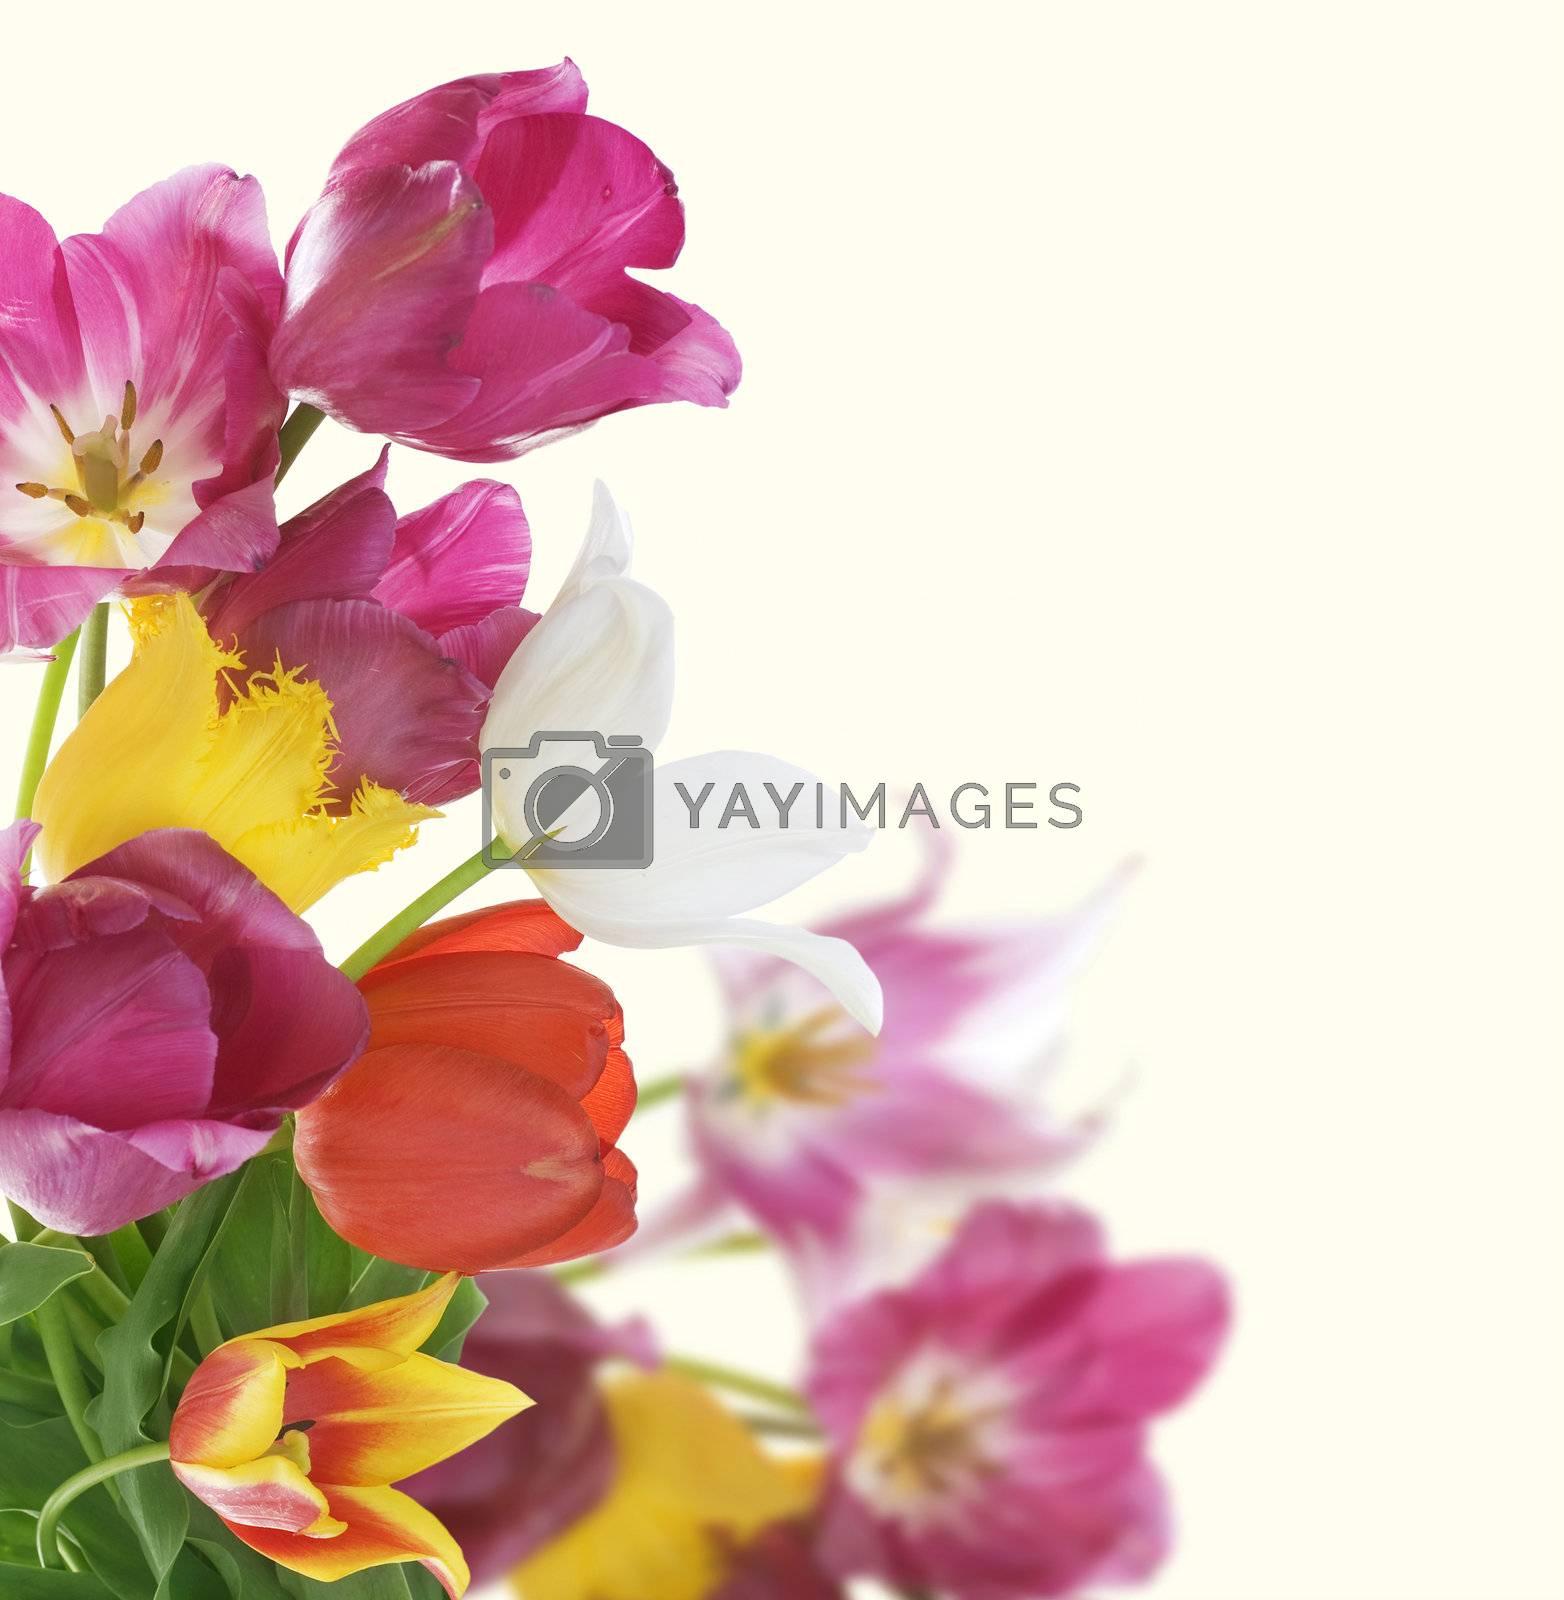 Flowers Border. Anniversary Card Design by Subbotina Anna